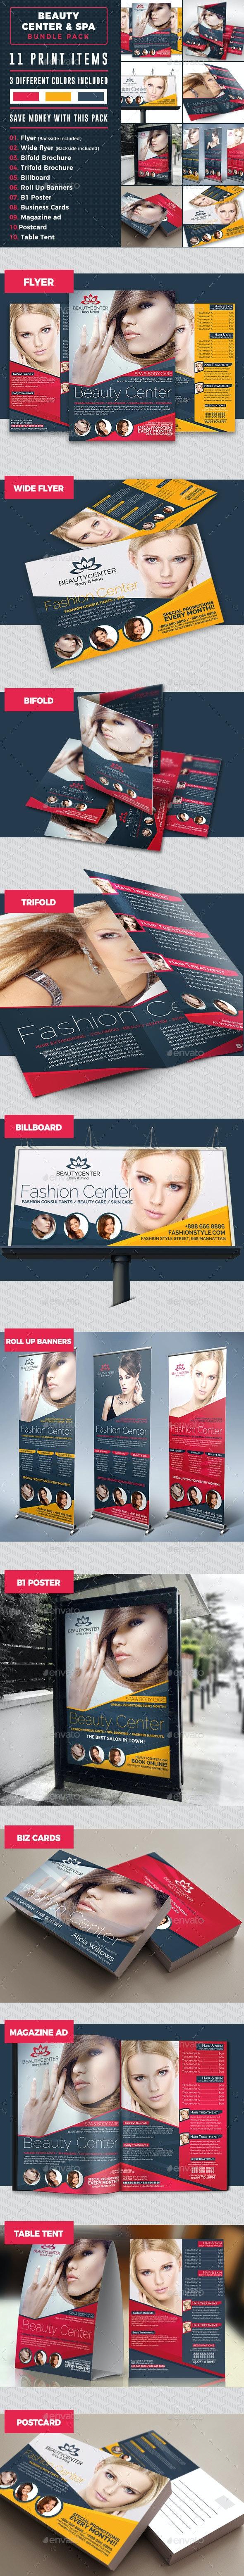 Beauty Center Print Template Bundle - Stationery Print Templates